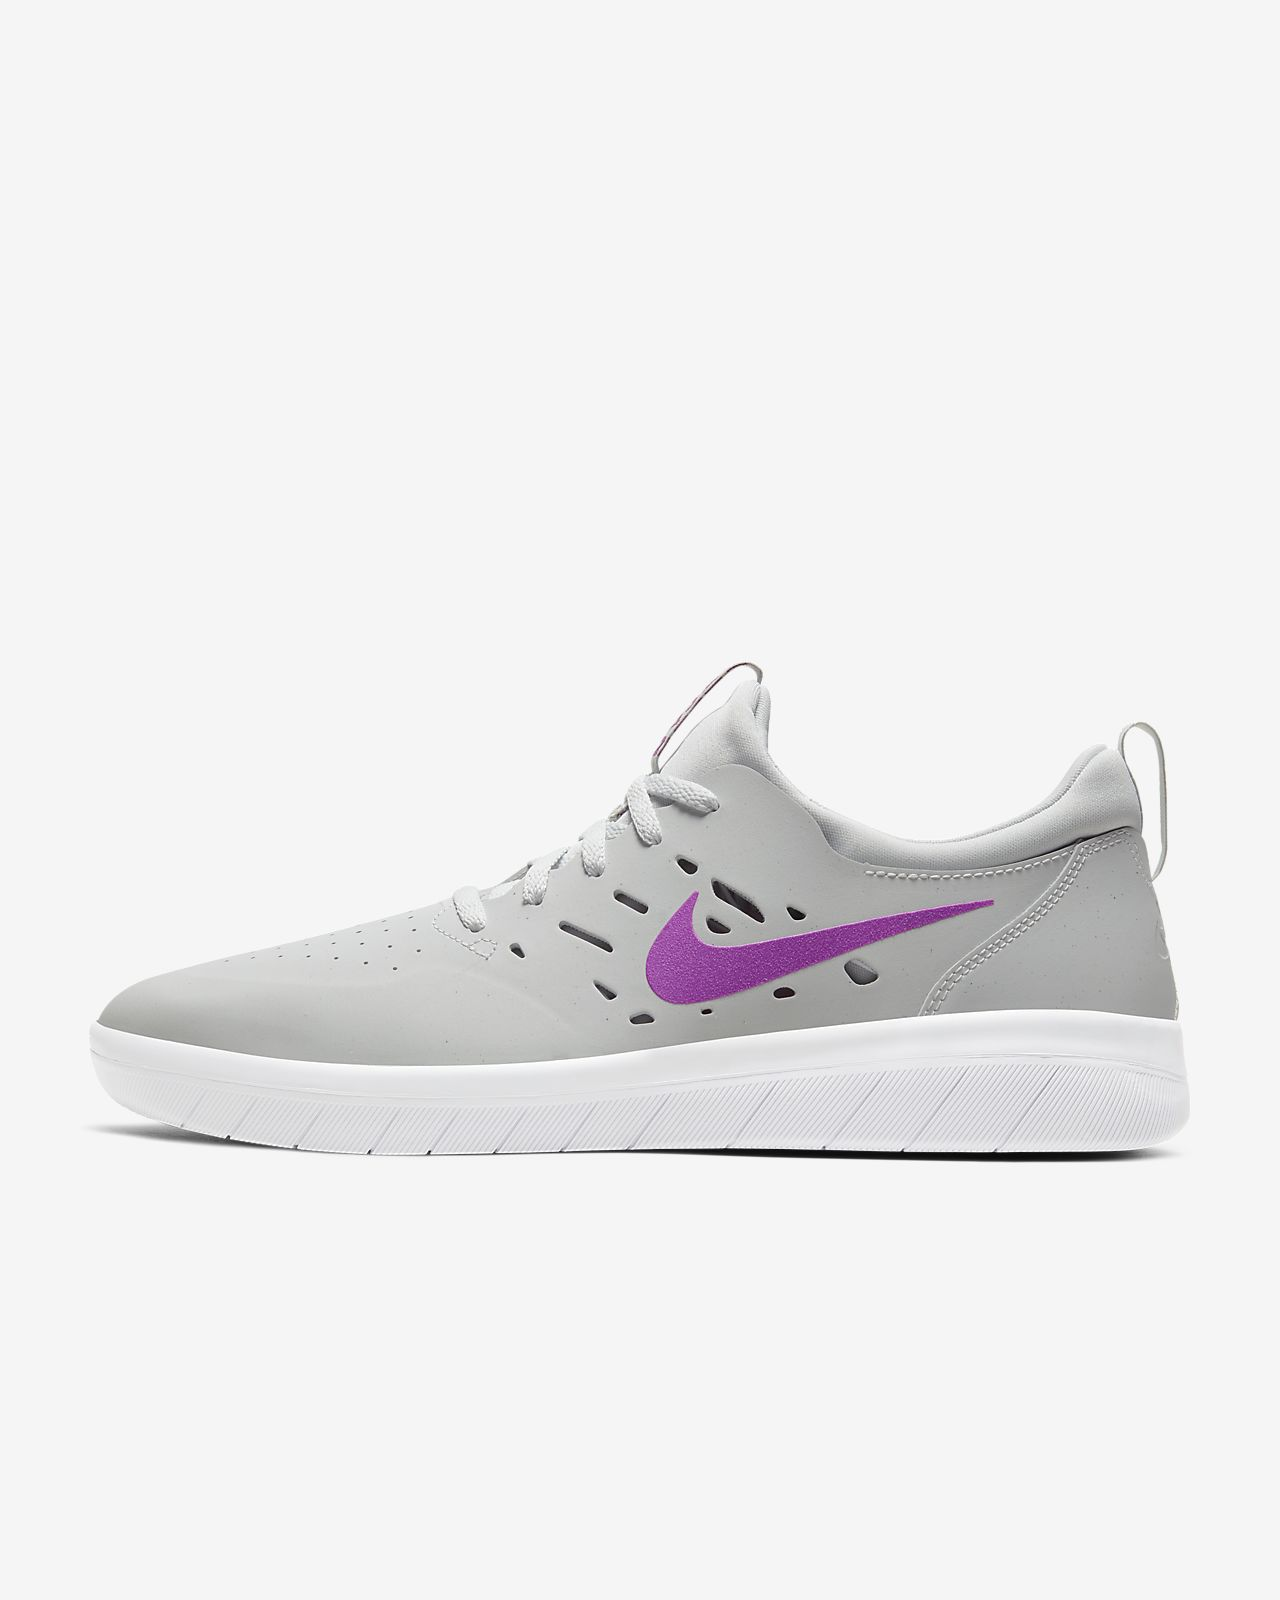 Nike SB Nyjah Huston Free Skate Shoes Black Gum Sole Skateboard Women 8.5 Men 7